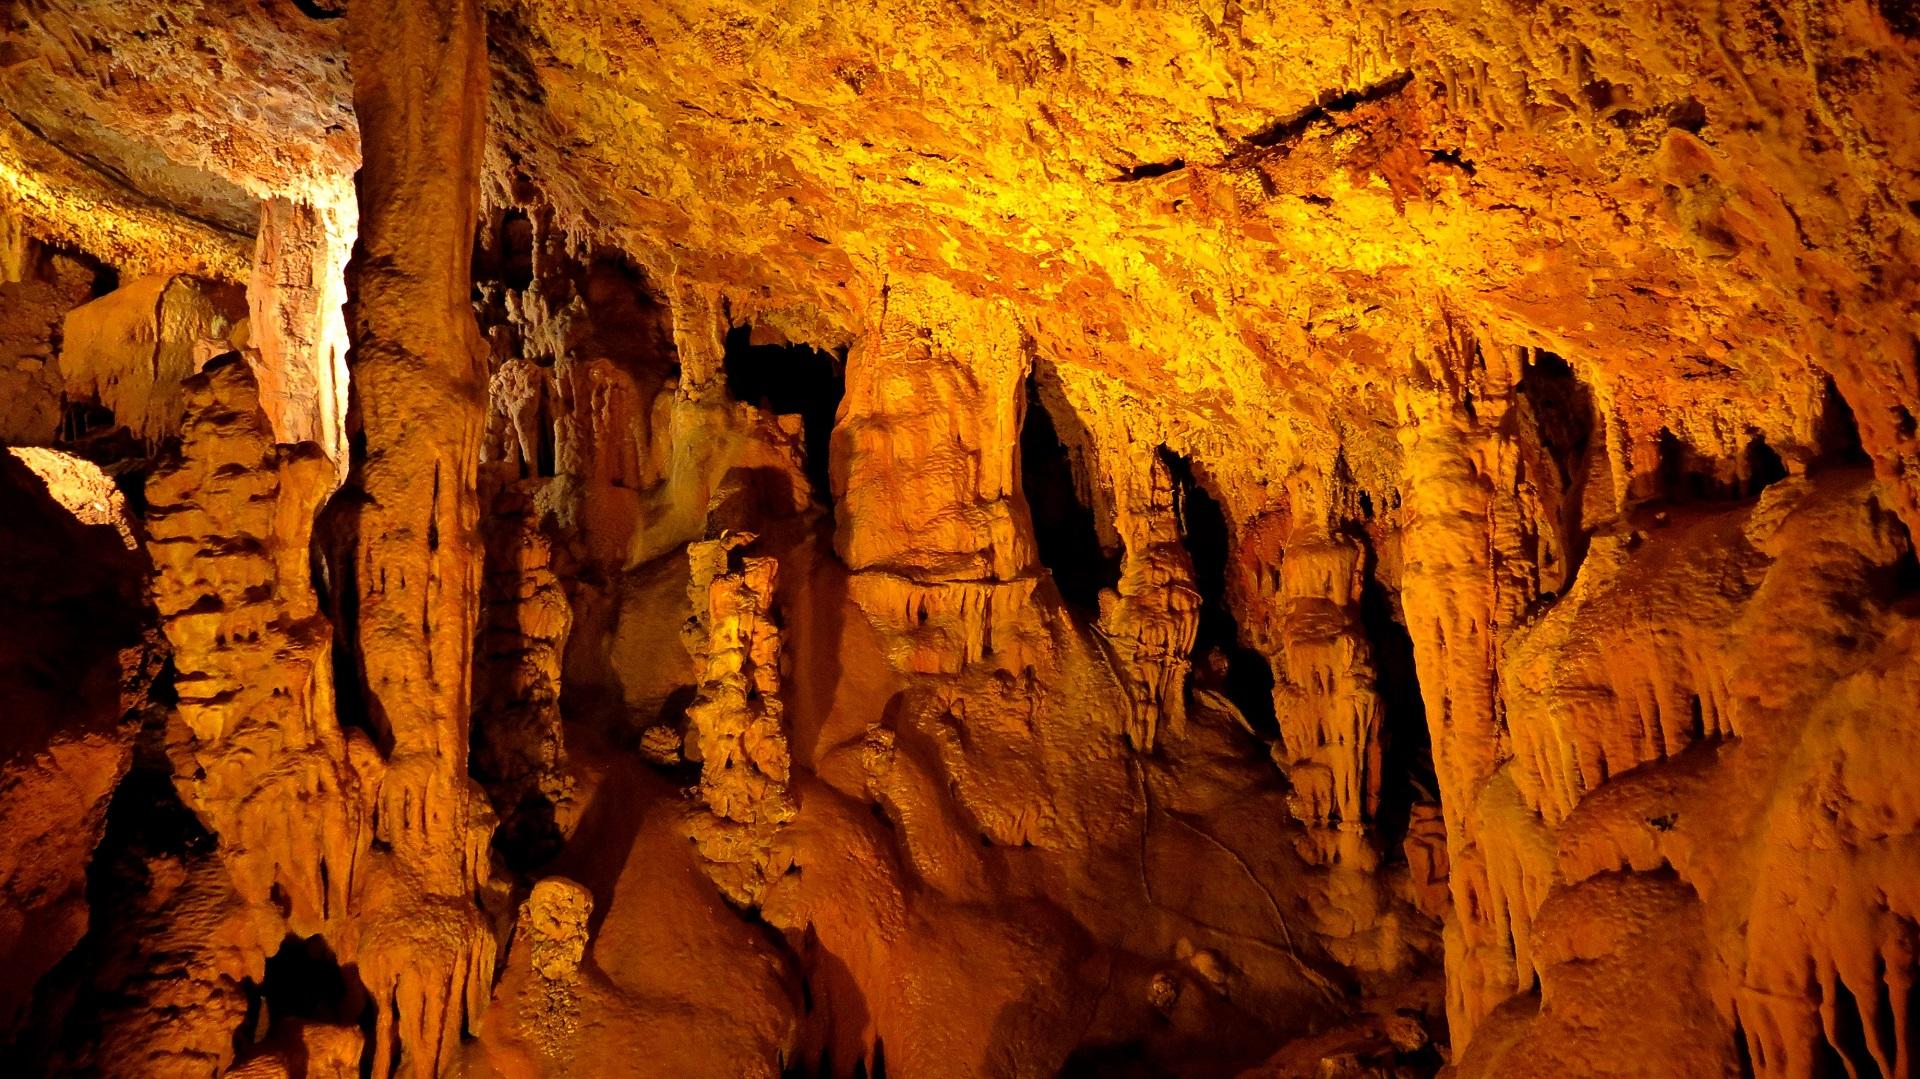 canelobre cave